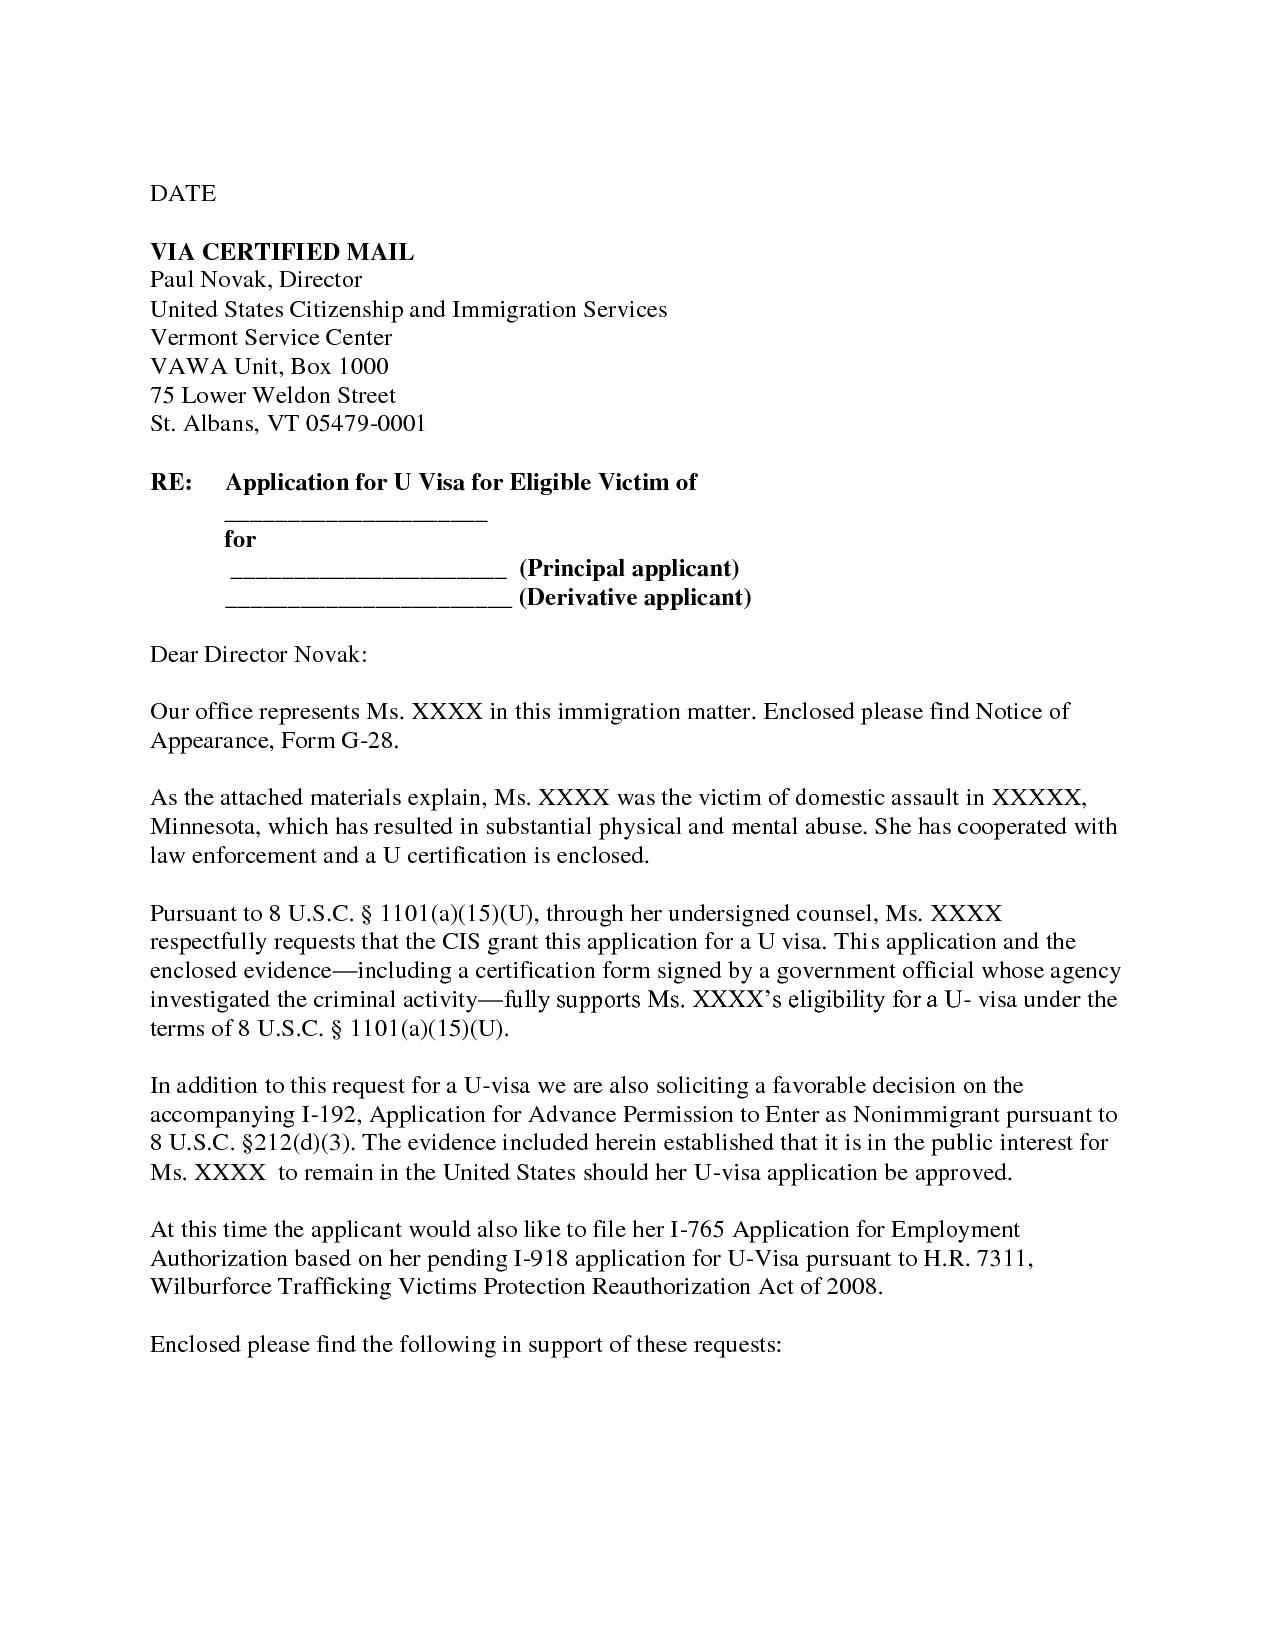 Letter Example Of Waiver Letter For Immigration Sample Templatevisa Application  Letter Application Letter Sample